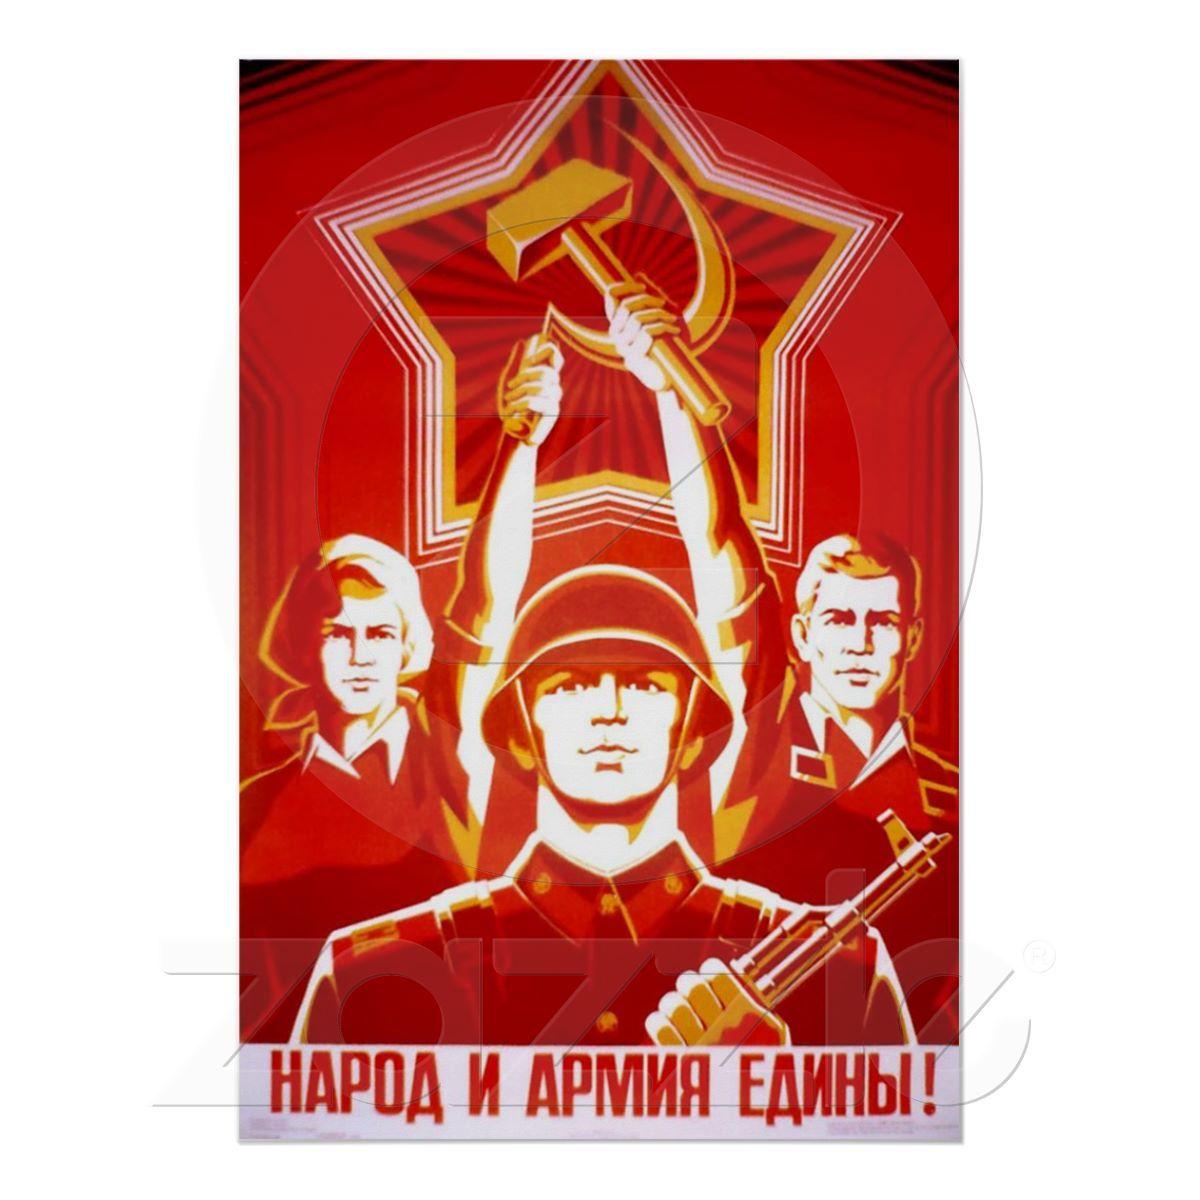 Ussr Cccp Cold War Soviet Union Propaganda Posters Zazzle Com